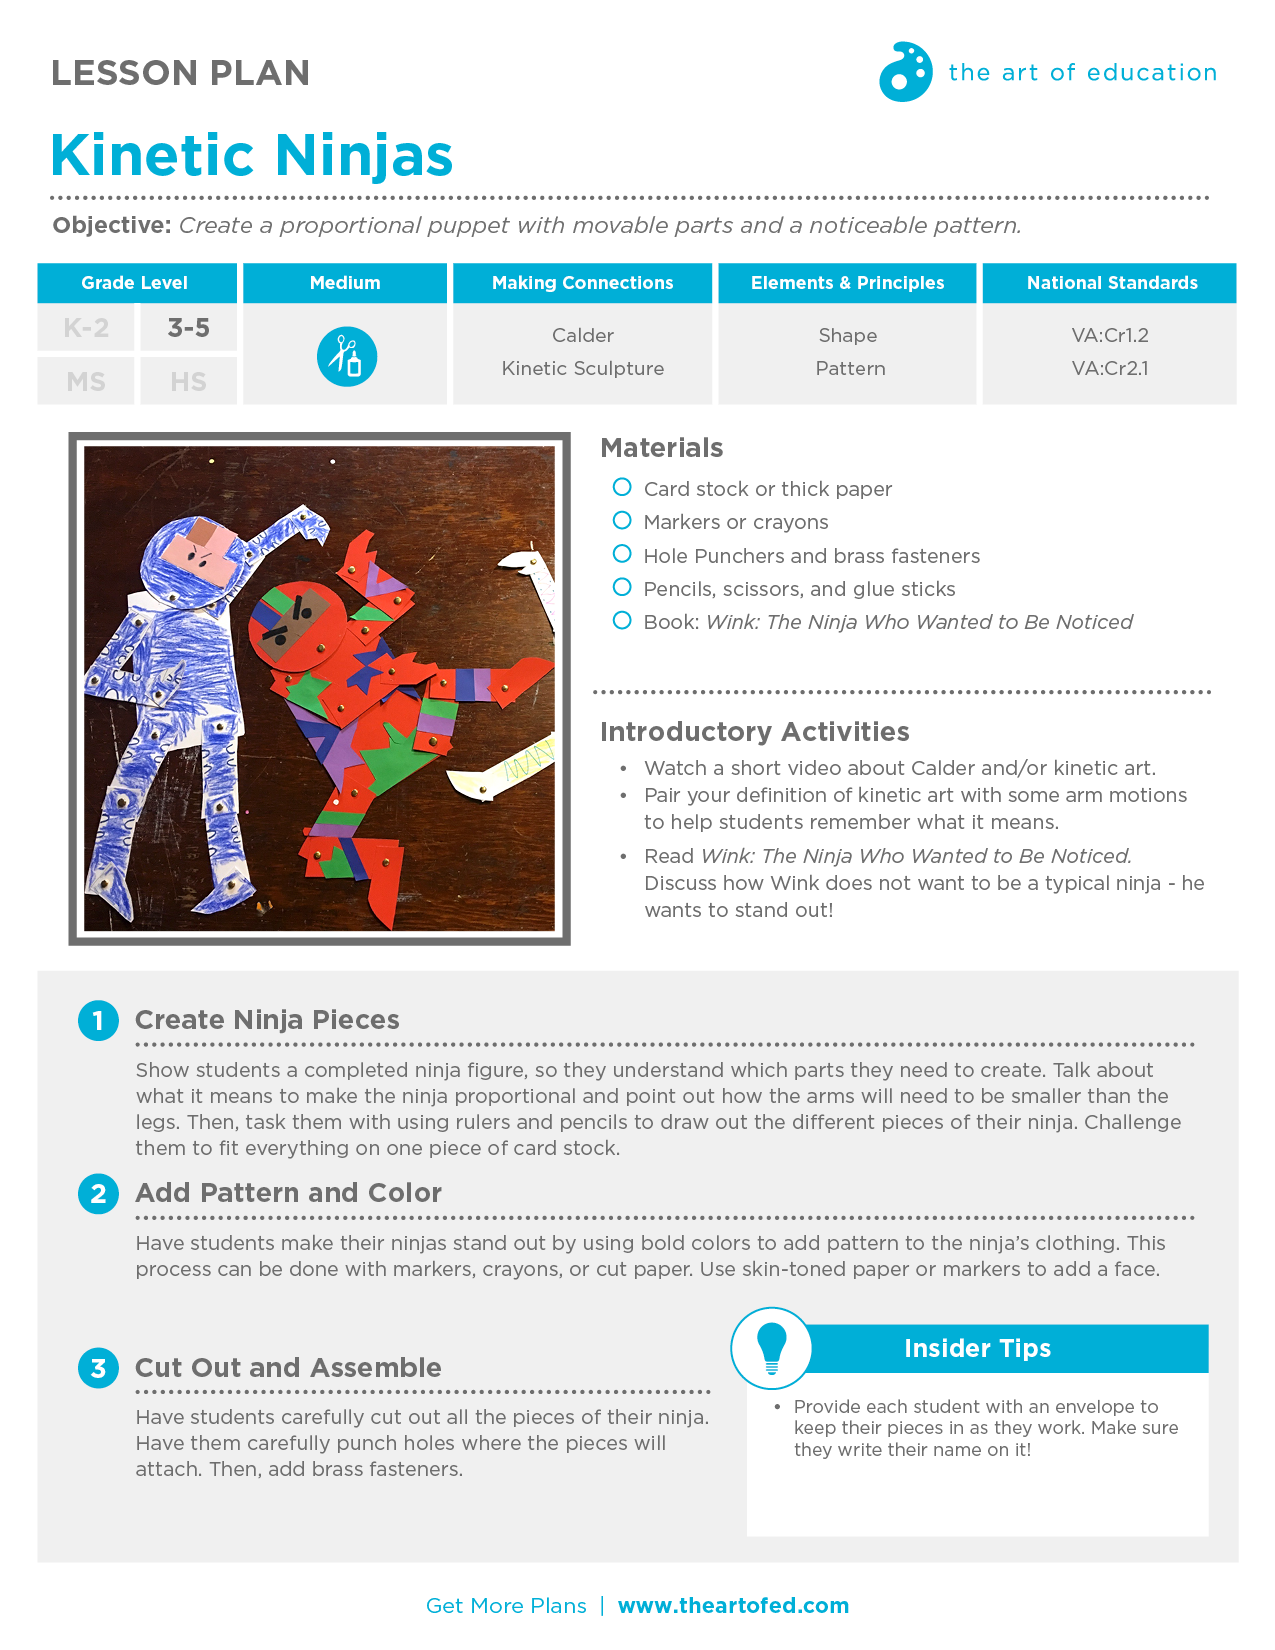 Kinetic Ninjas Free Lesson Plan Download